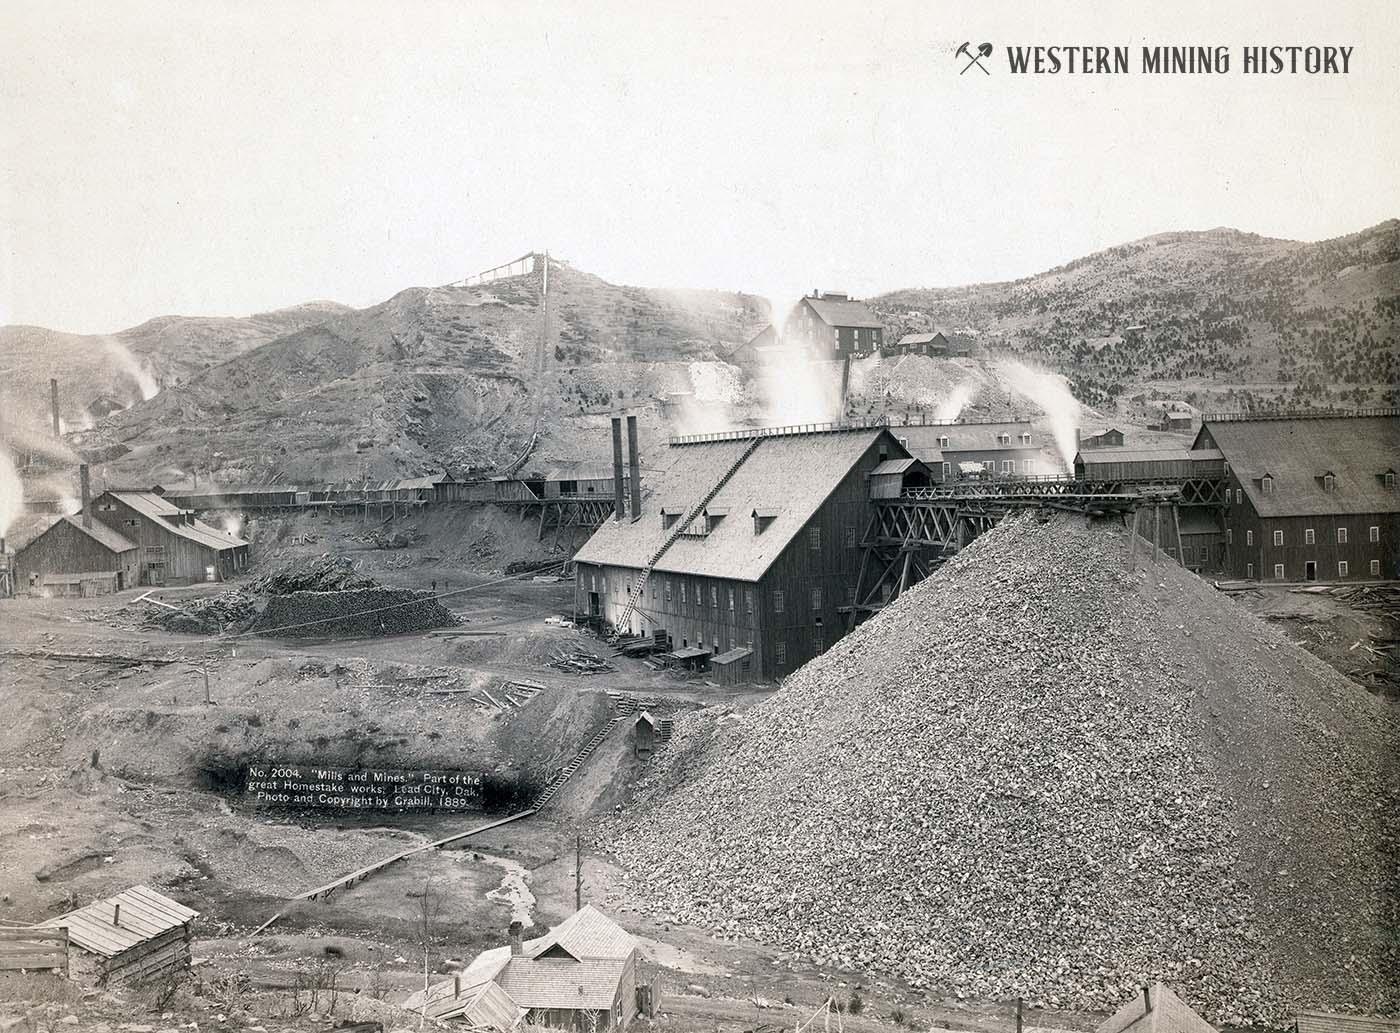 Homestake mine and mill at Lead, South Dakota 1889